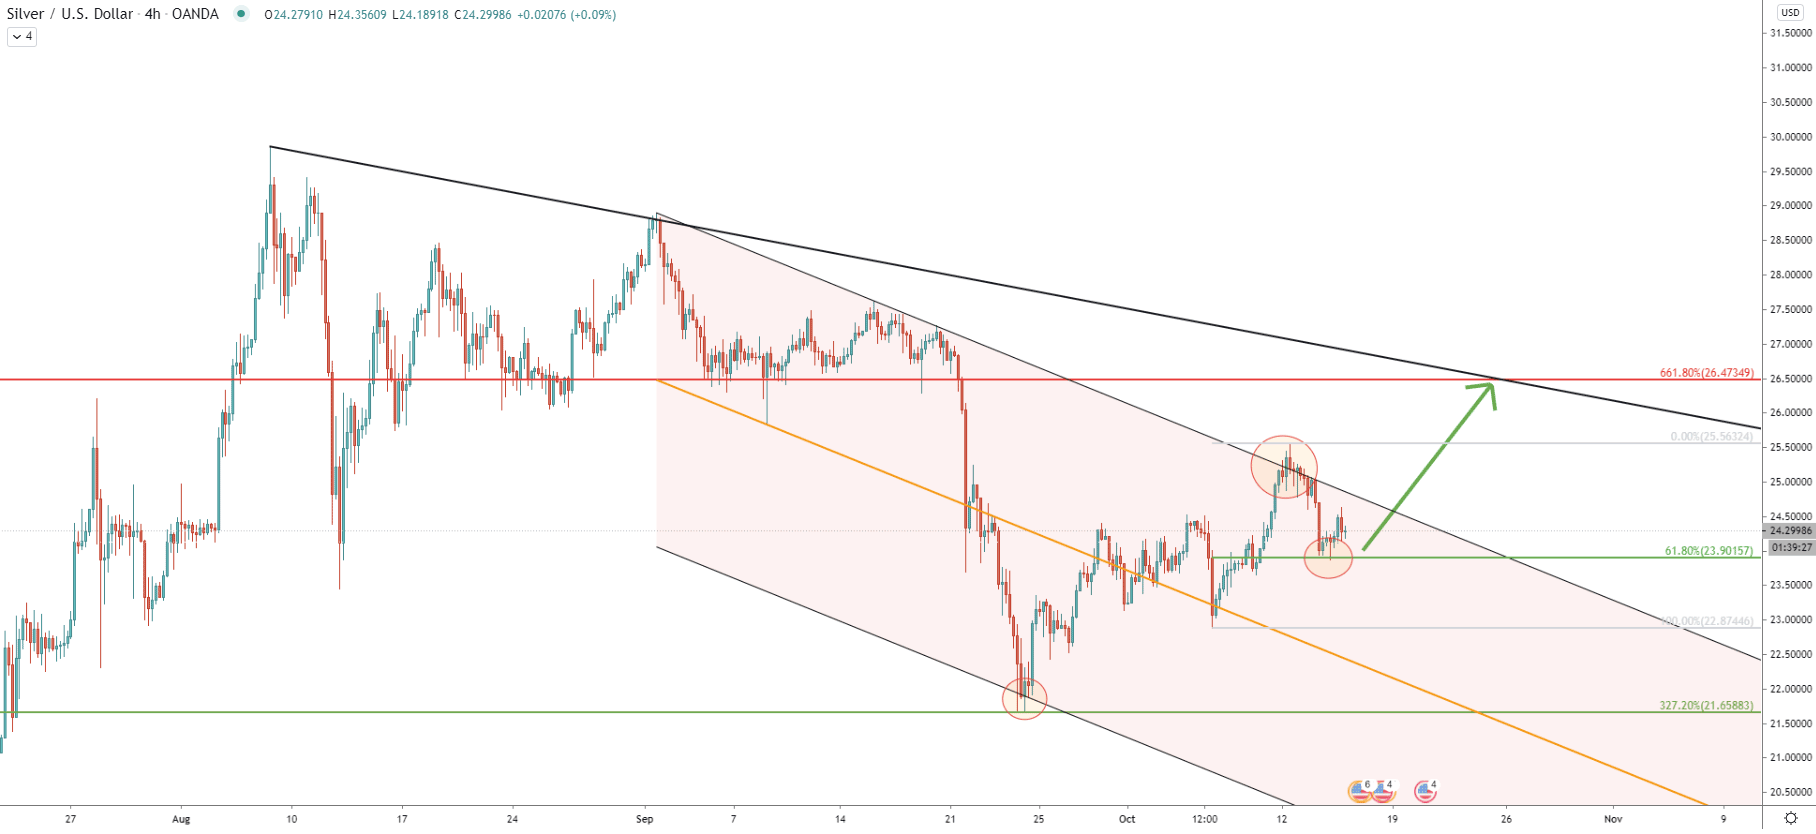 XAG/USD 4-Hour Technical Analysis 14 Oct 2020